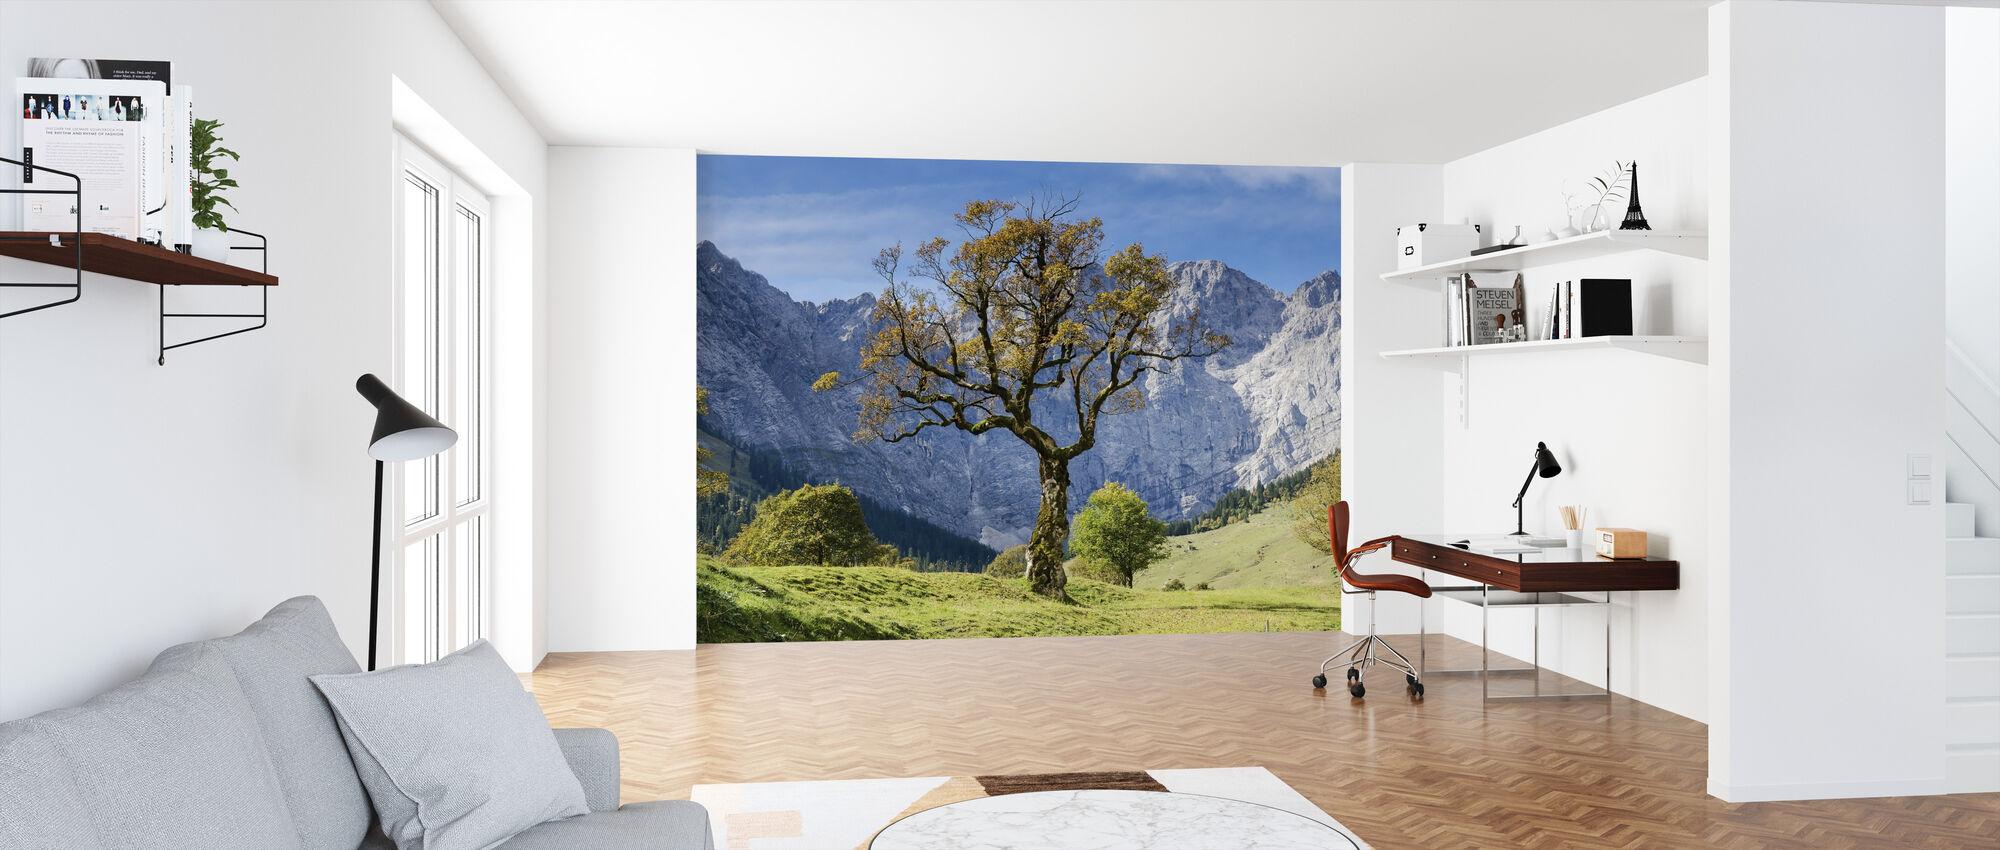 The Tree - Wallpaper - Office